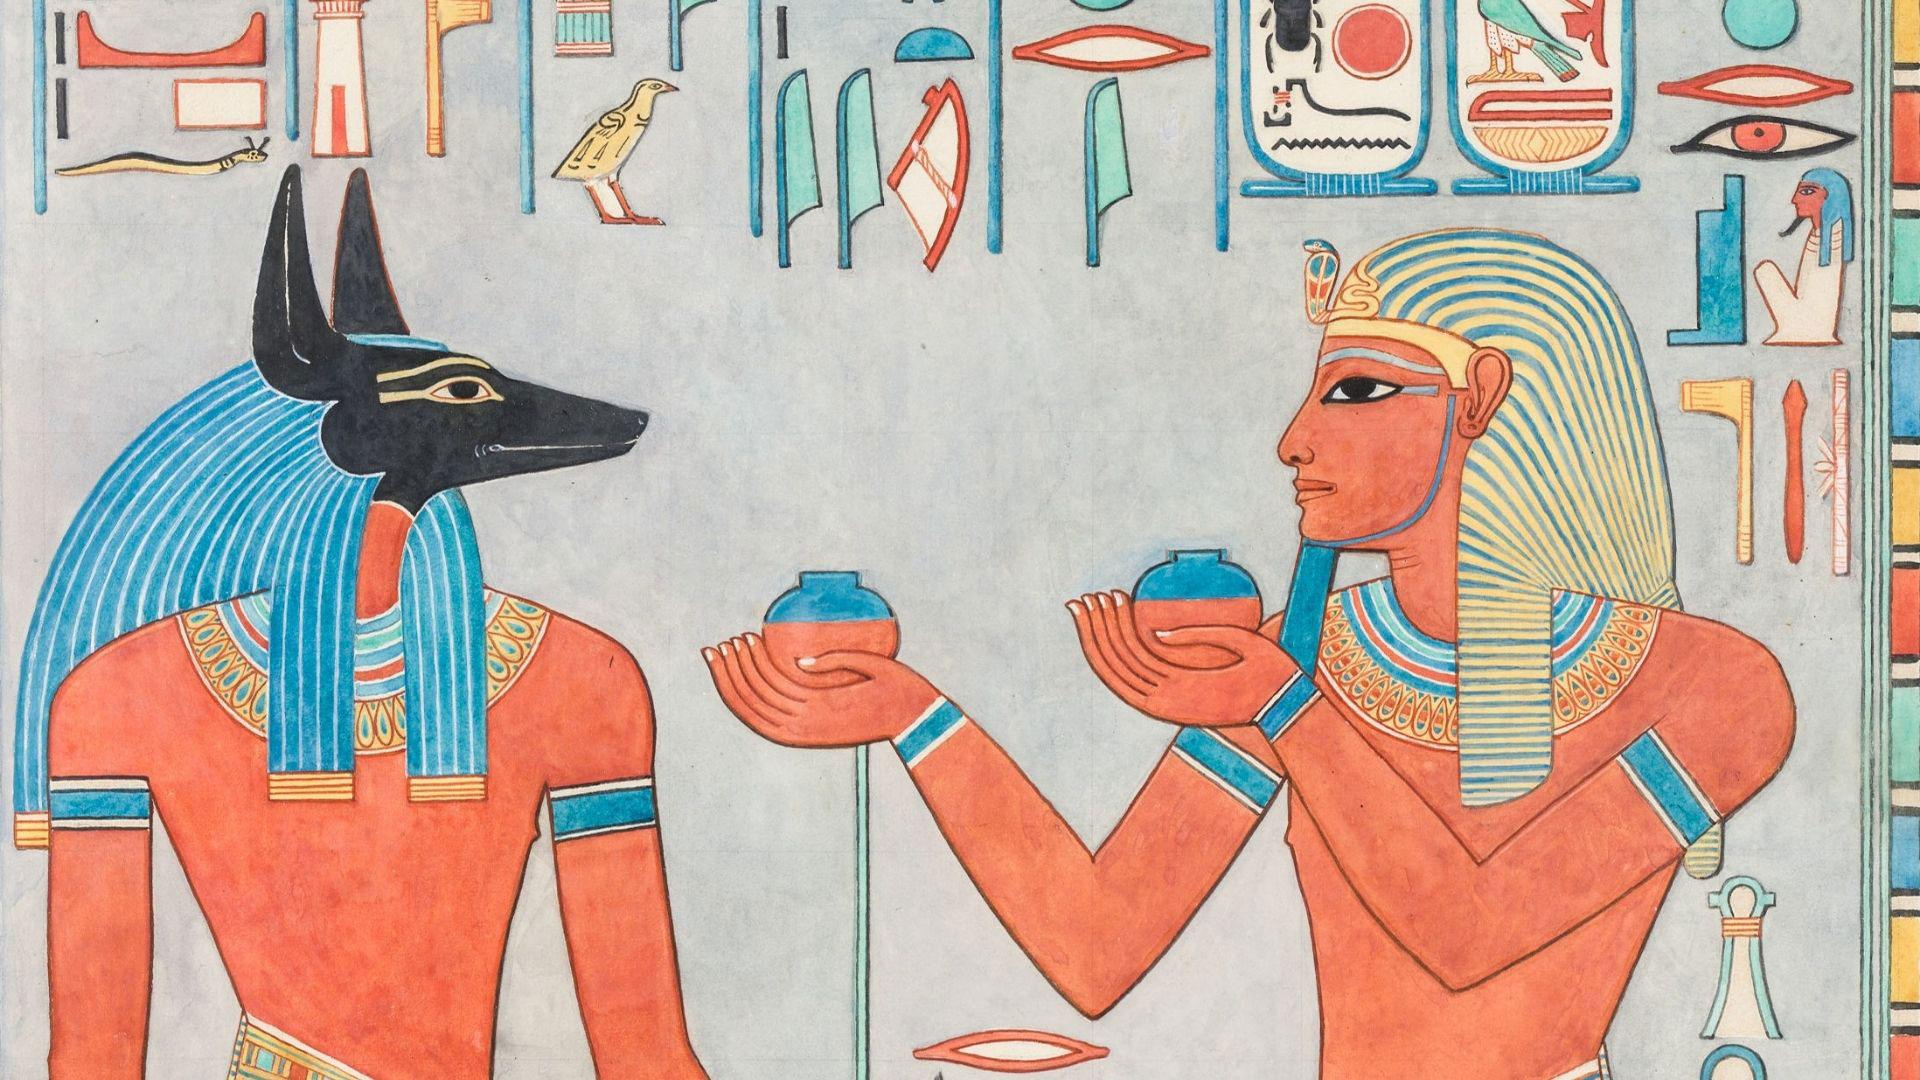 Episode-315-Myths-and-Legends-Anubis